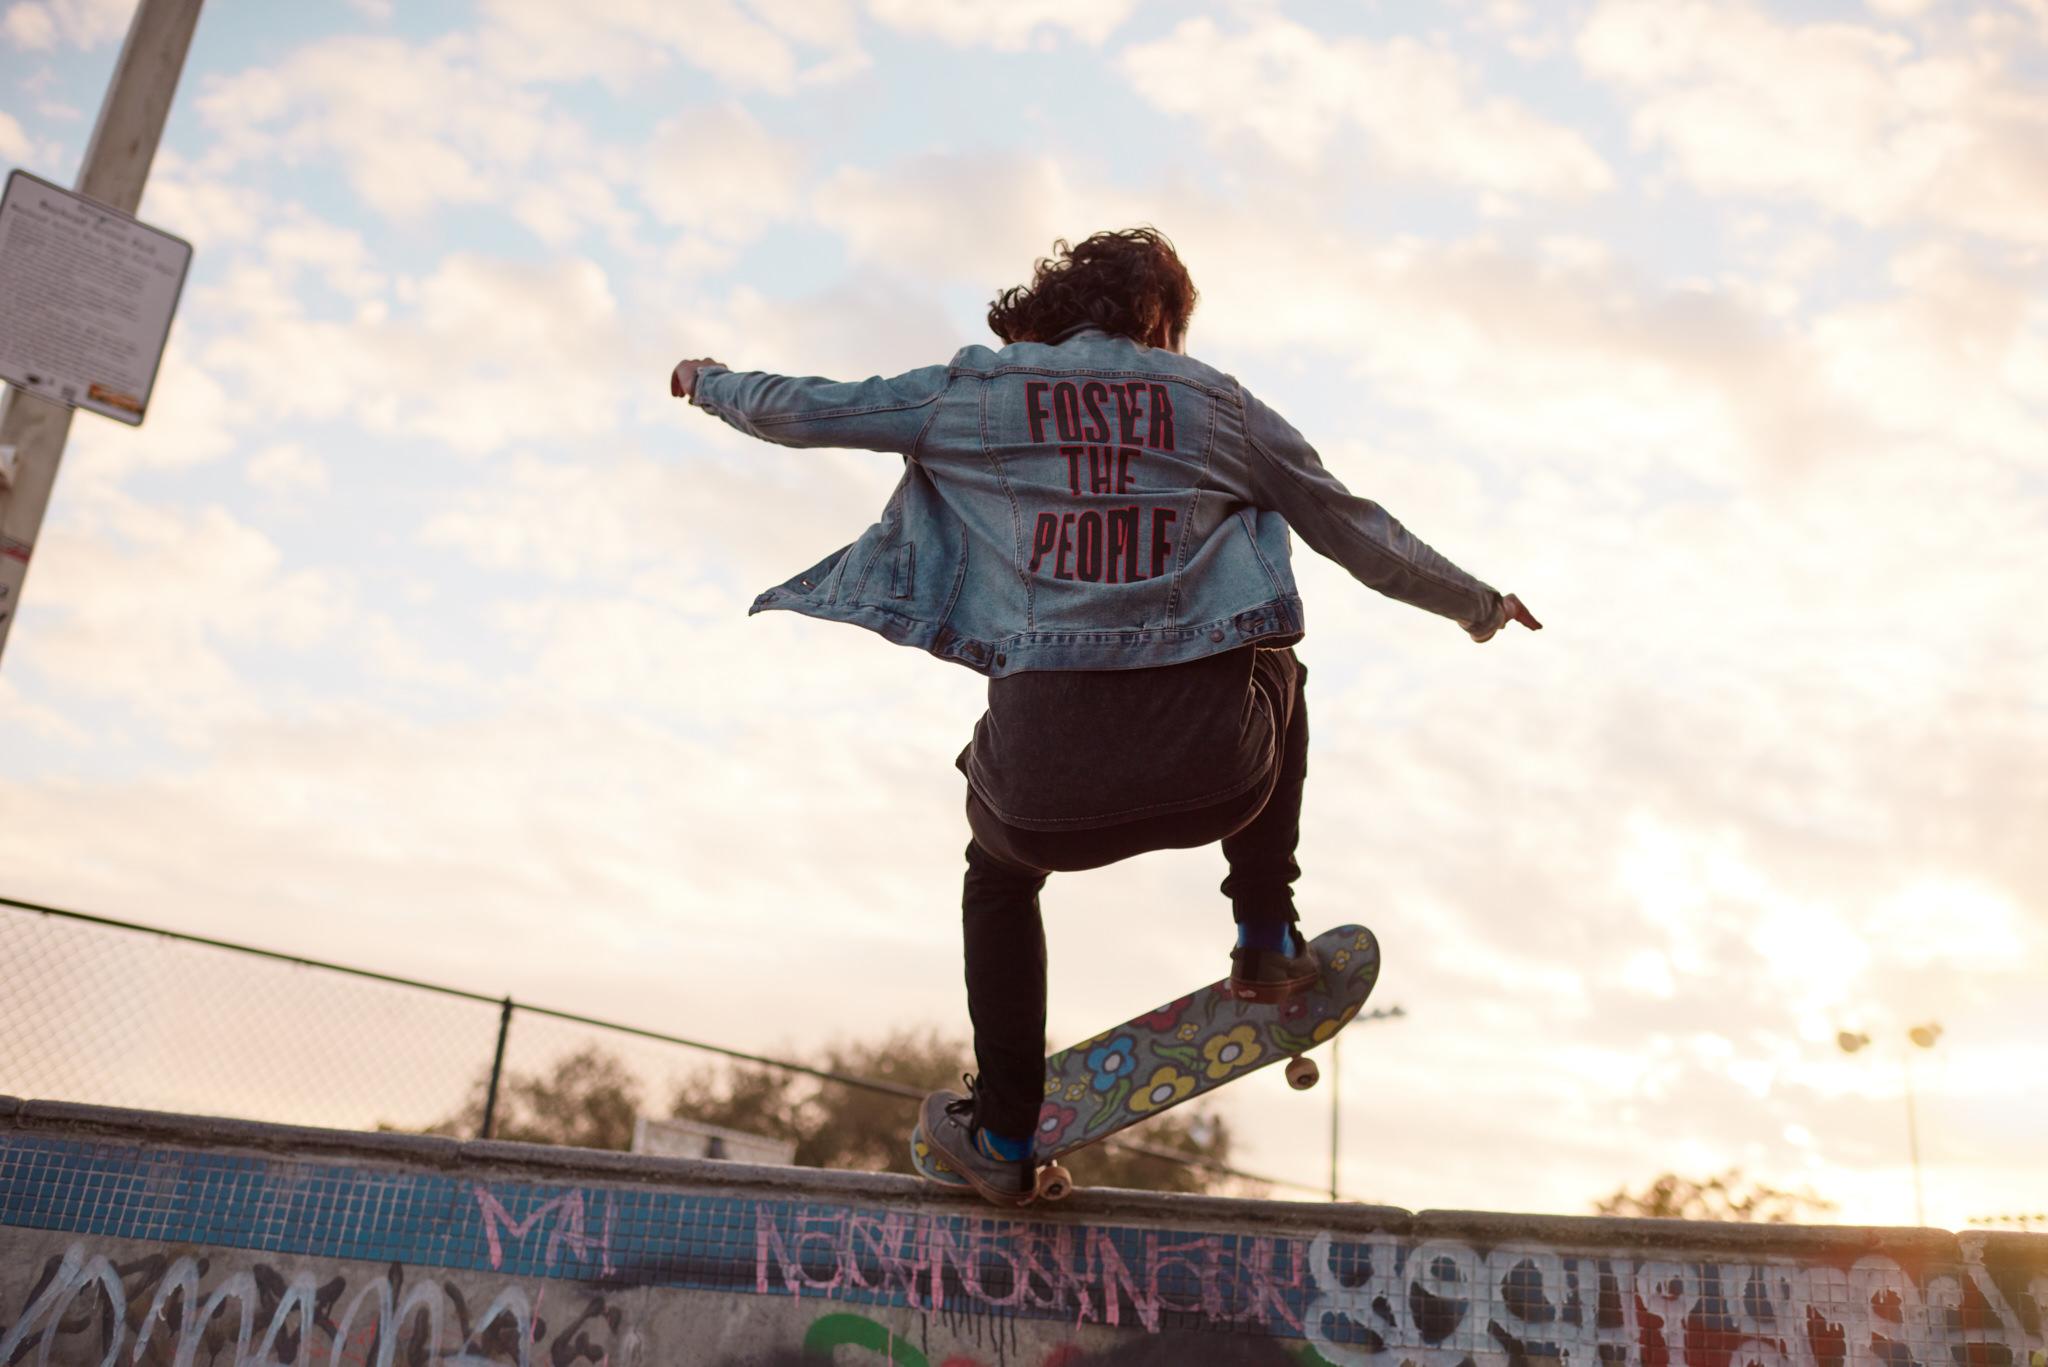 2019-01-19 - Austin Robles 10.jpg